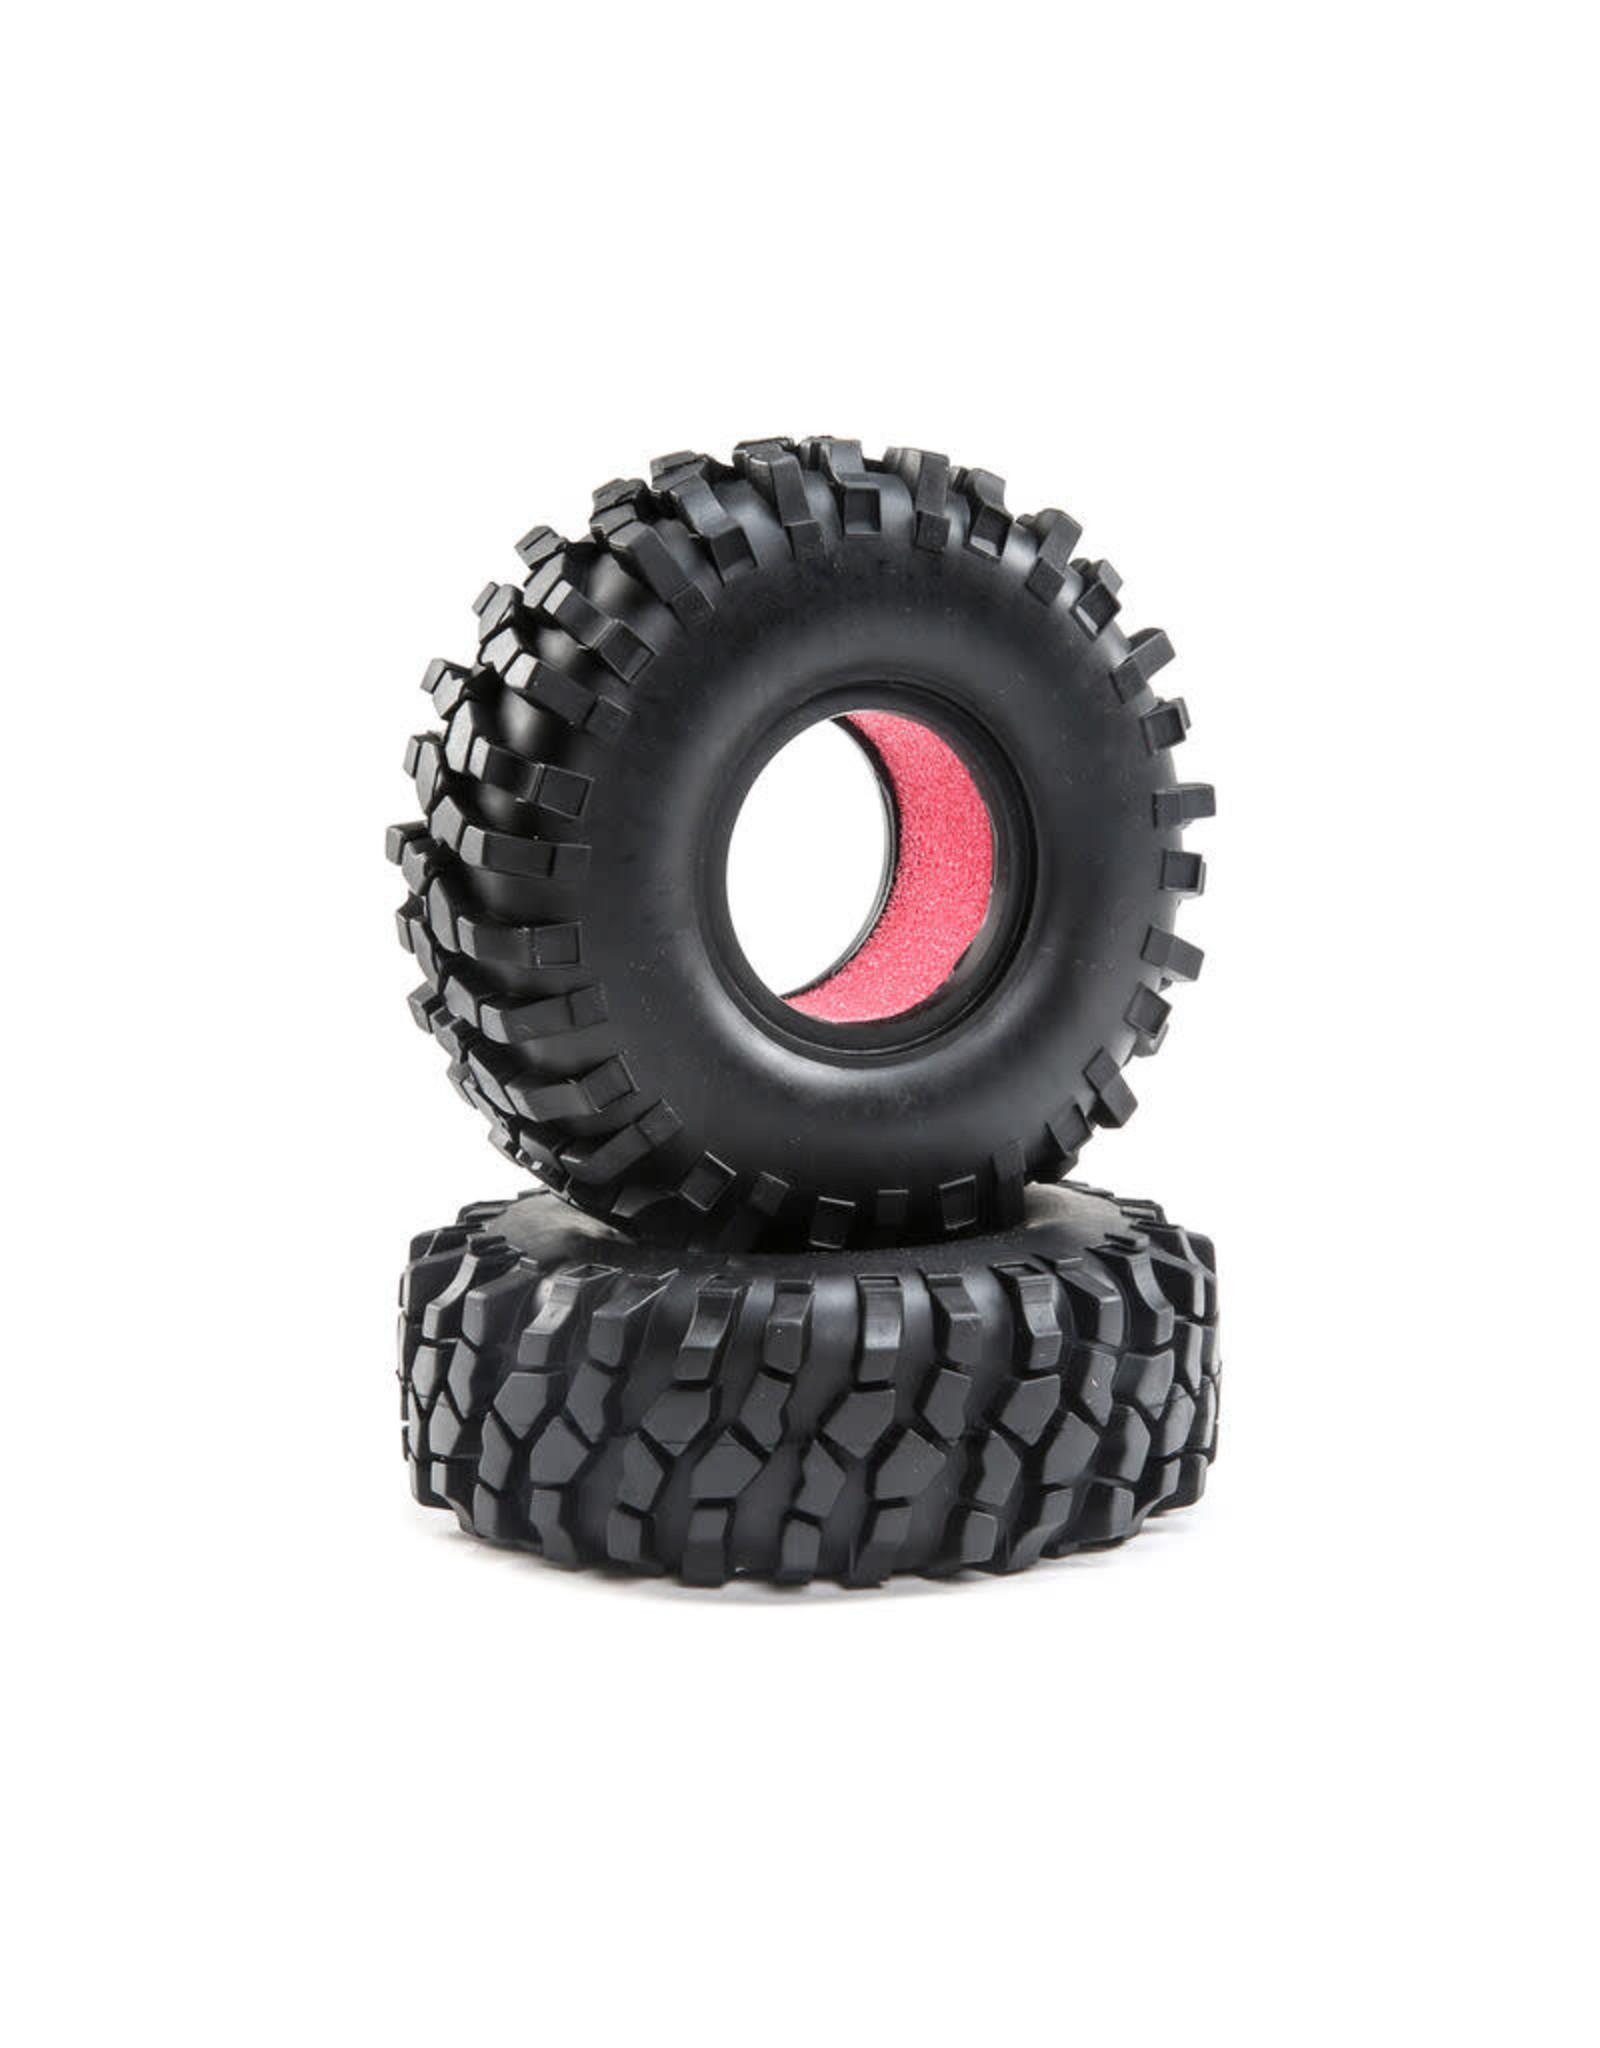 ECX FR/RR Tire with Foam: Temper G2